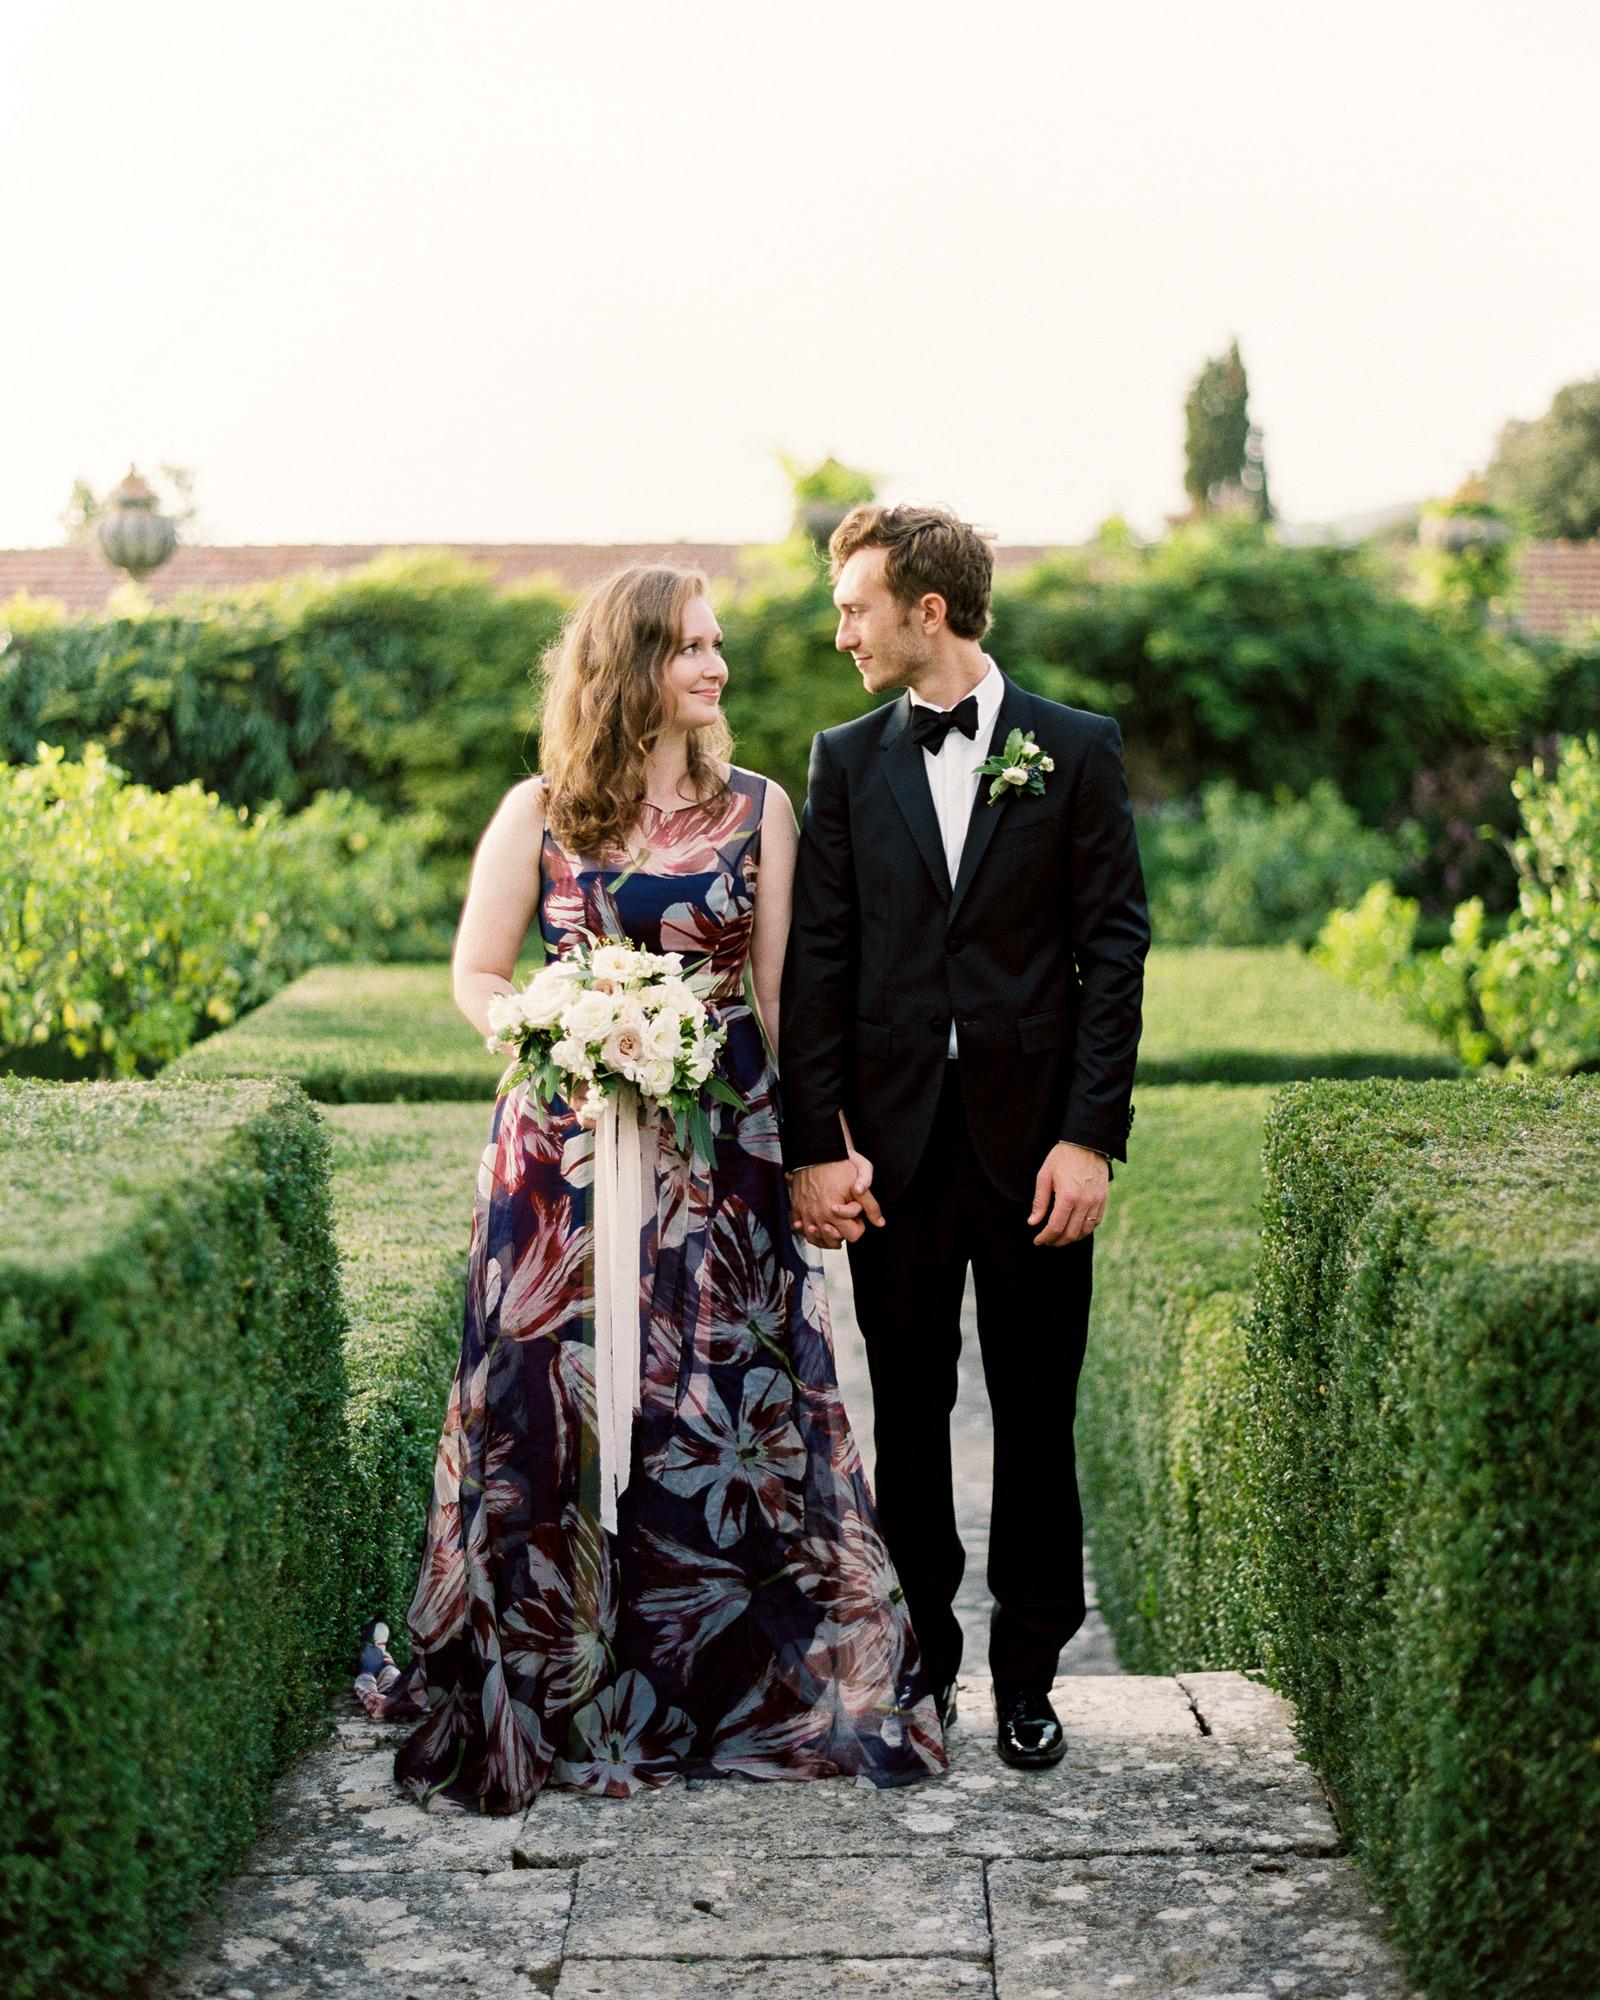 christine-dagan-wedding-couple-4321_09-s113011-0616.jpg